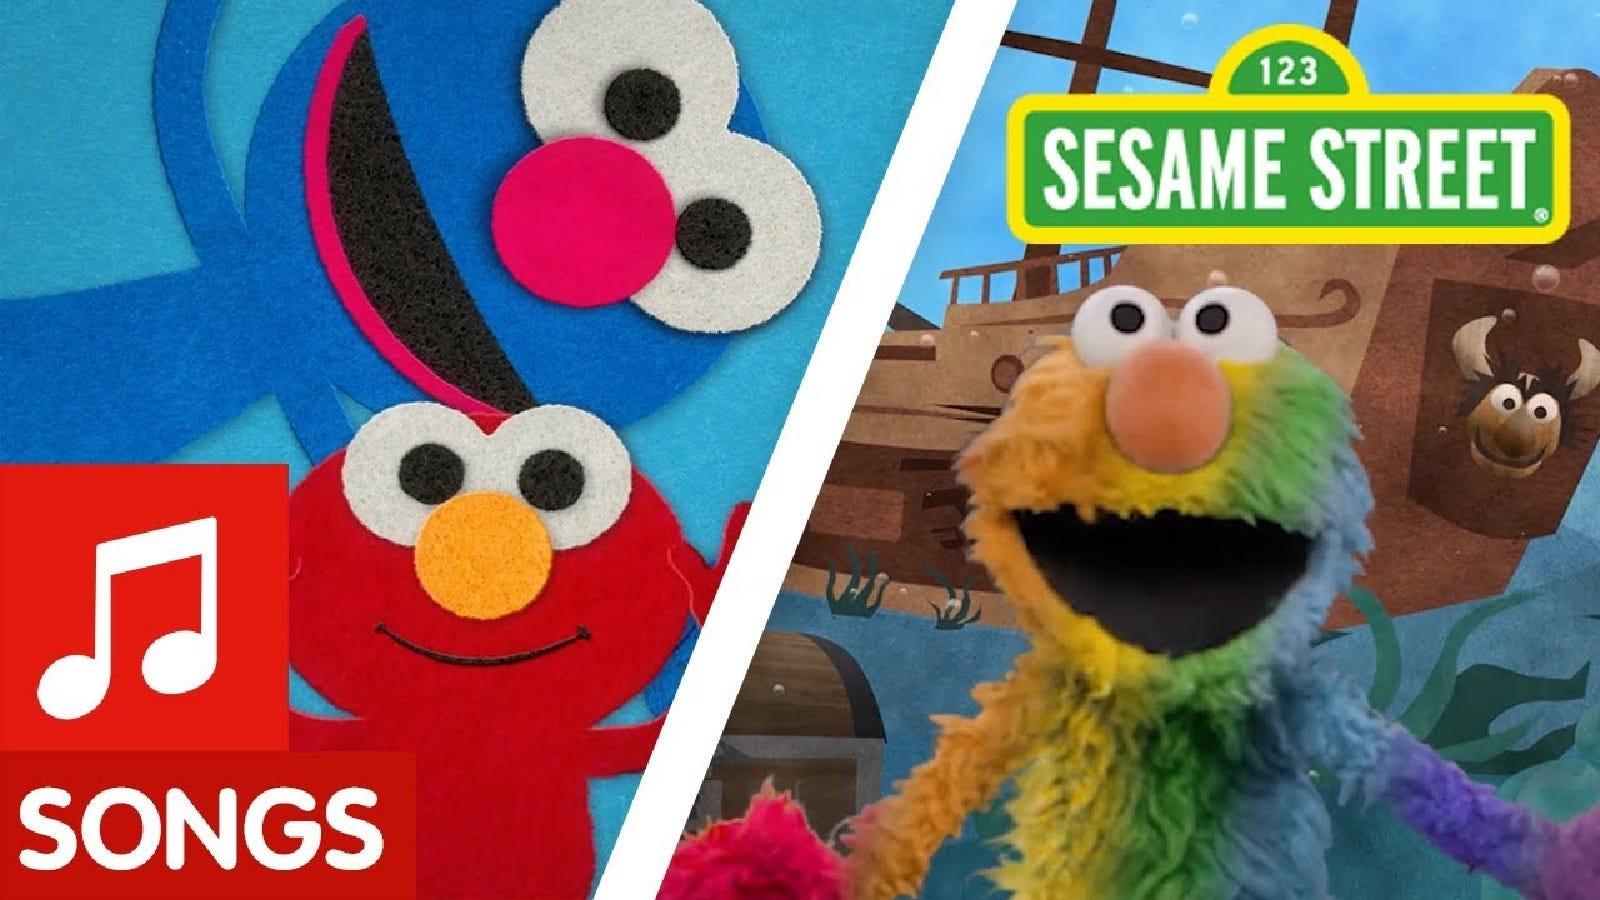 Promotional image for Sesame Street, depicting Elmo singing educational songs.